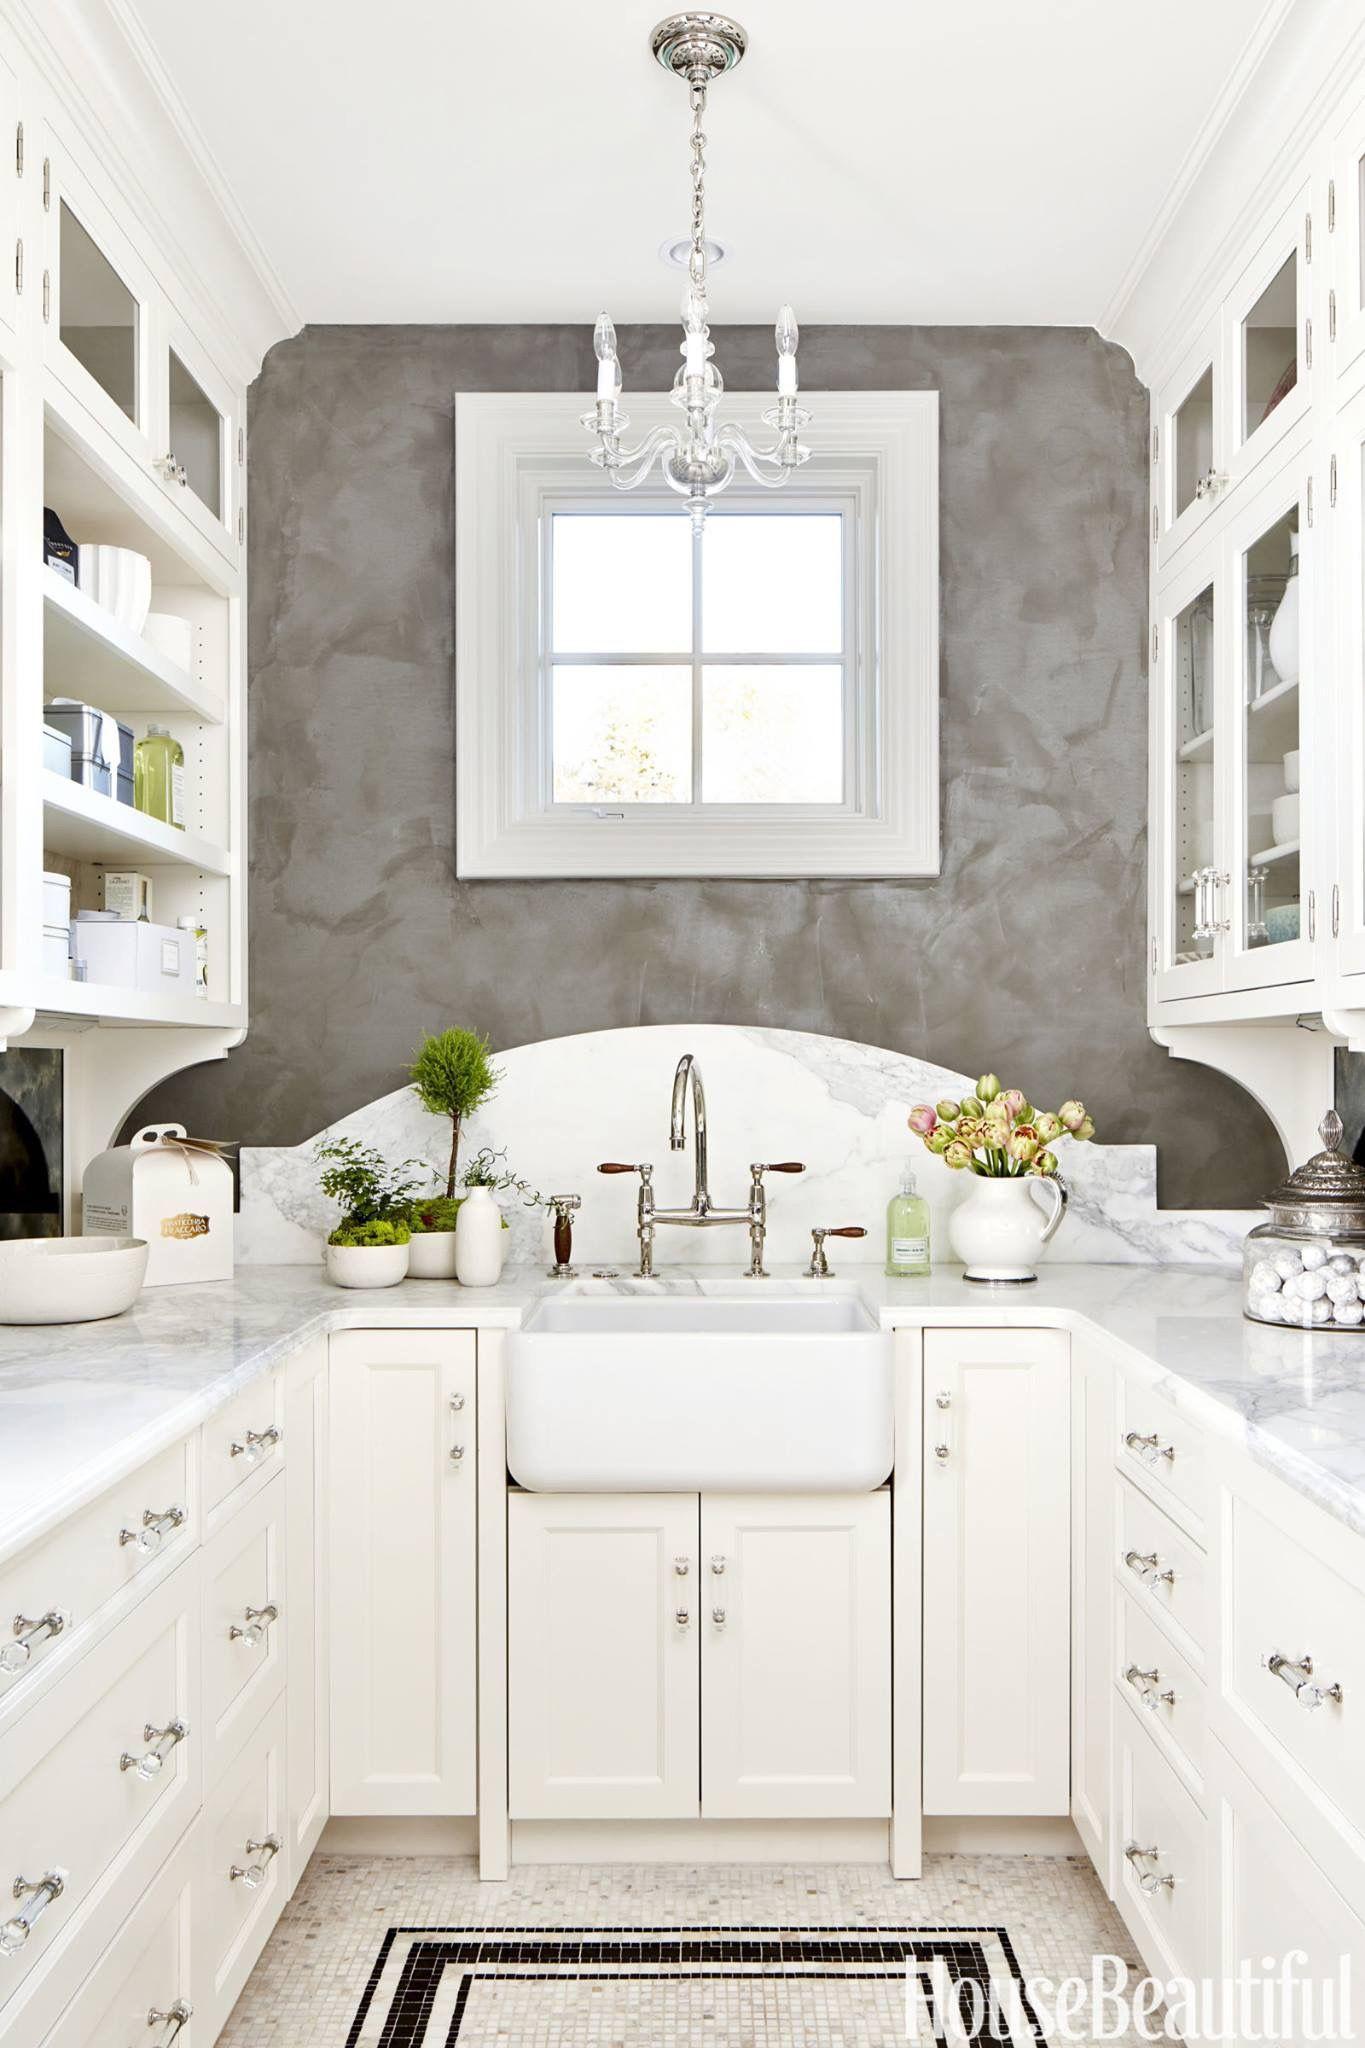 Classic Small Kitchen Luxury Kitchens Luxury Kitchen Design Kitchen Design Small